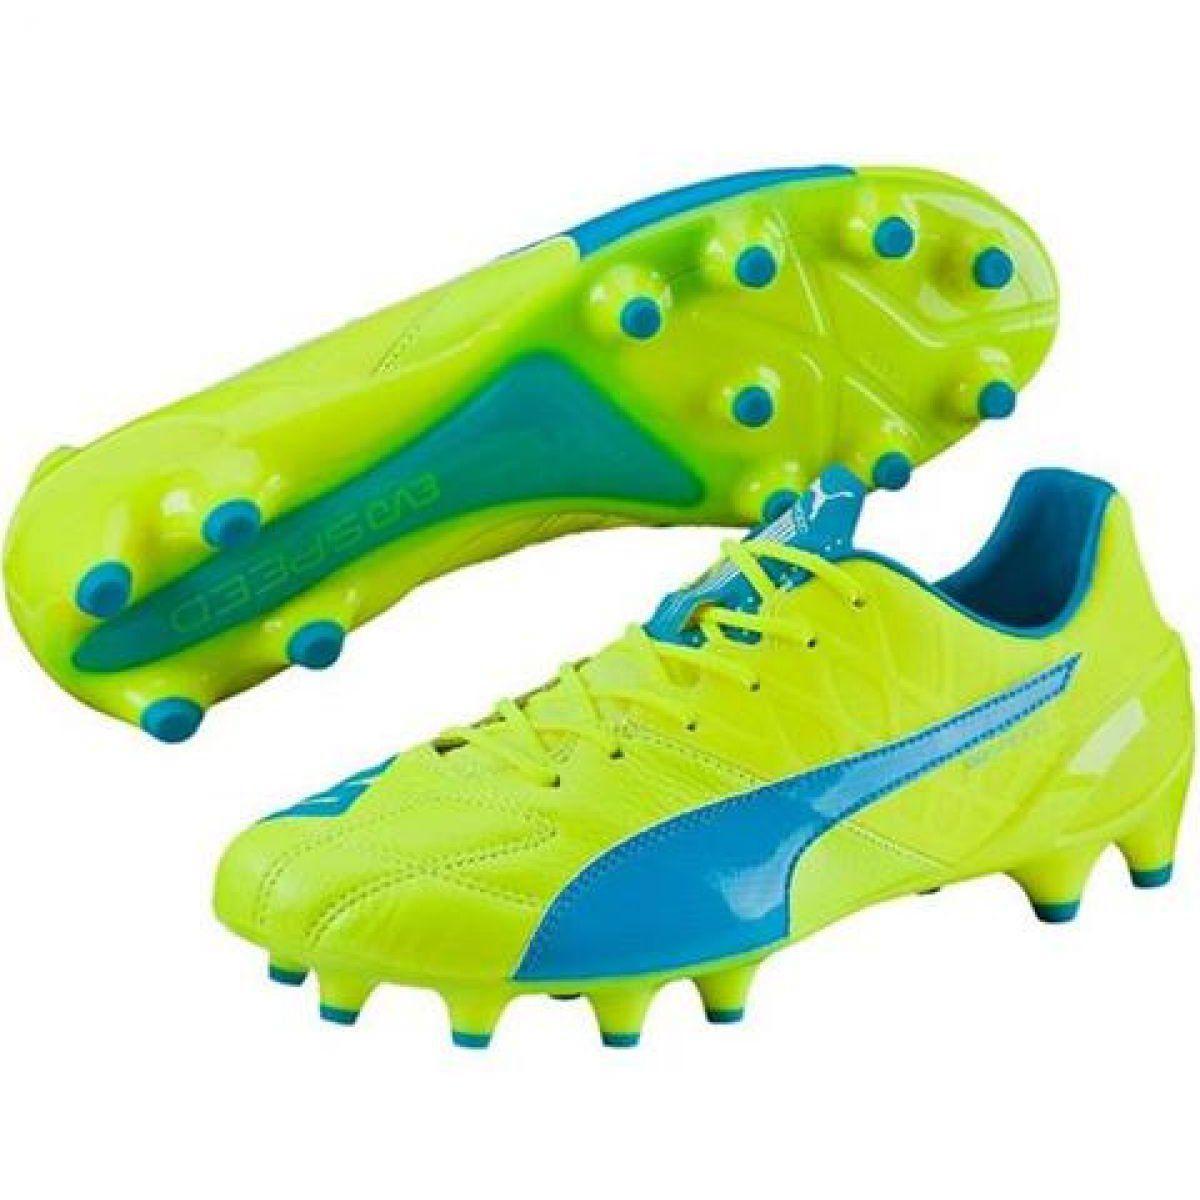 Buty Pilkarskie Puma Evo Speed 1 4 Lth Fg M 103615 03 Zolte Zolte Sport Shoes Puma Shoes